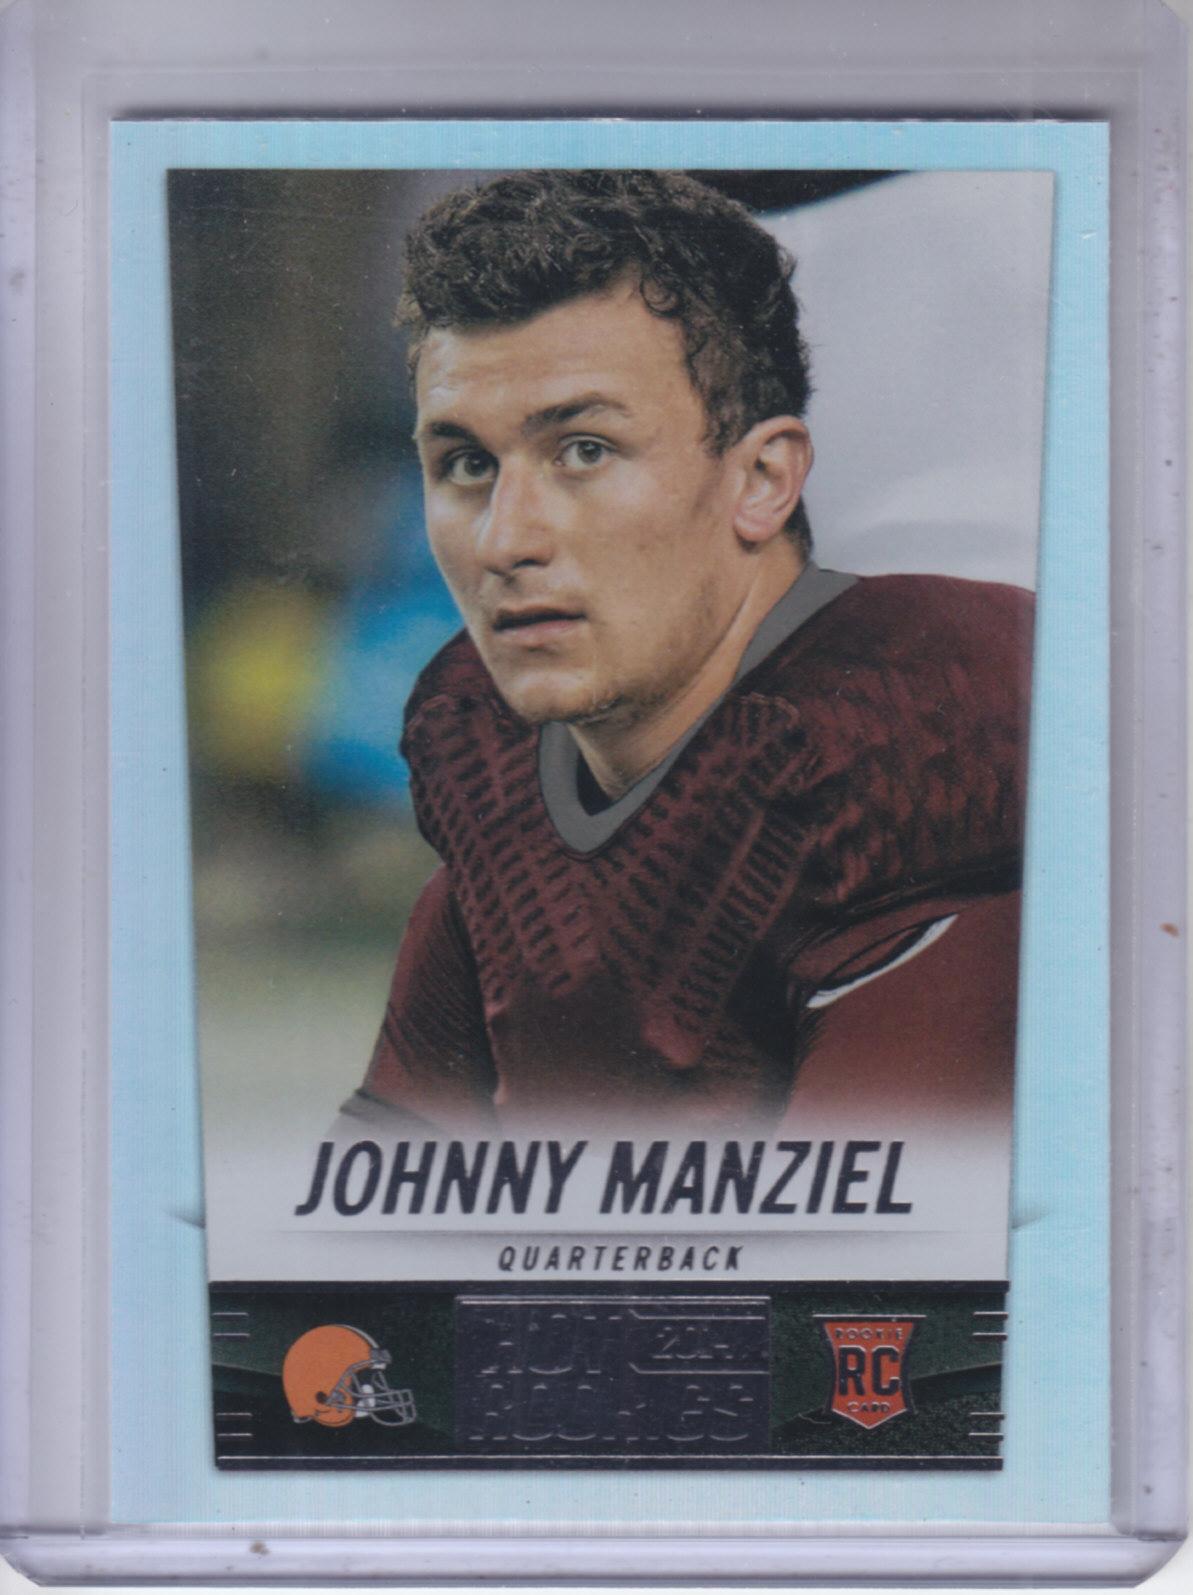 2014 Panini Hot Rookies #387 Johnny Manziel RC